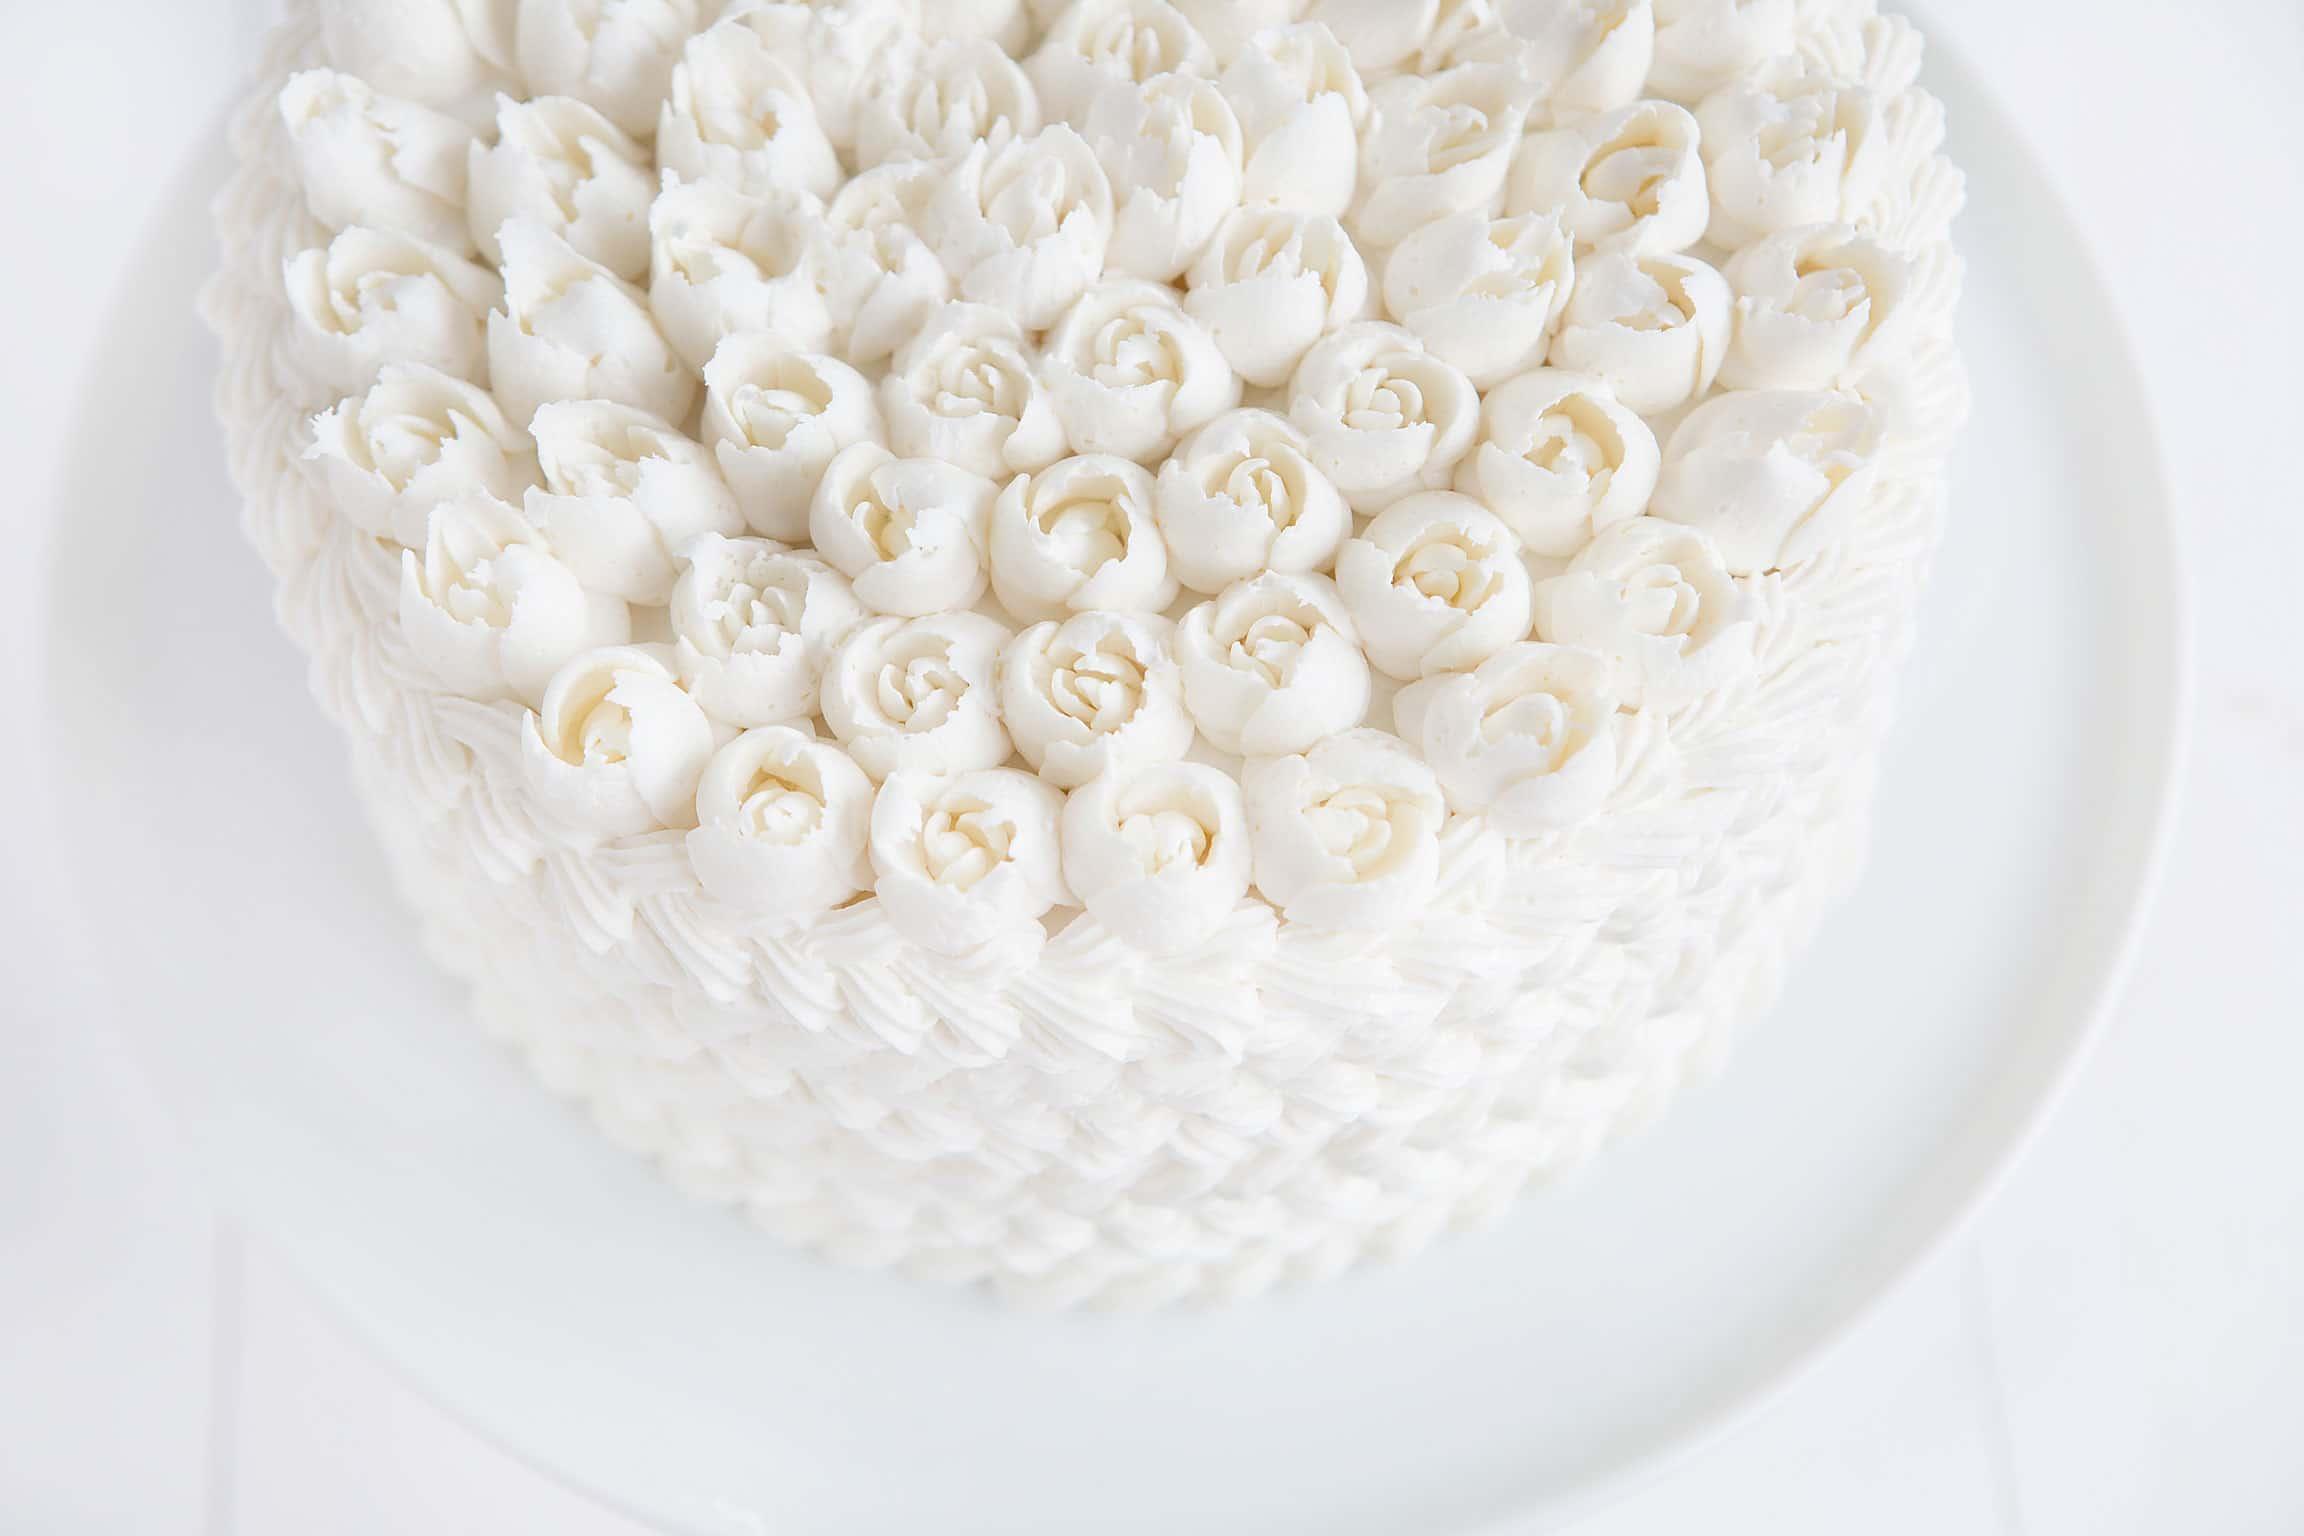 https://iambaker.net/wp-content/uploads/2017/06/wasc-cake-roses.jpg